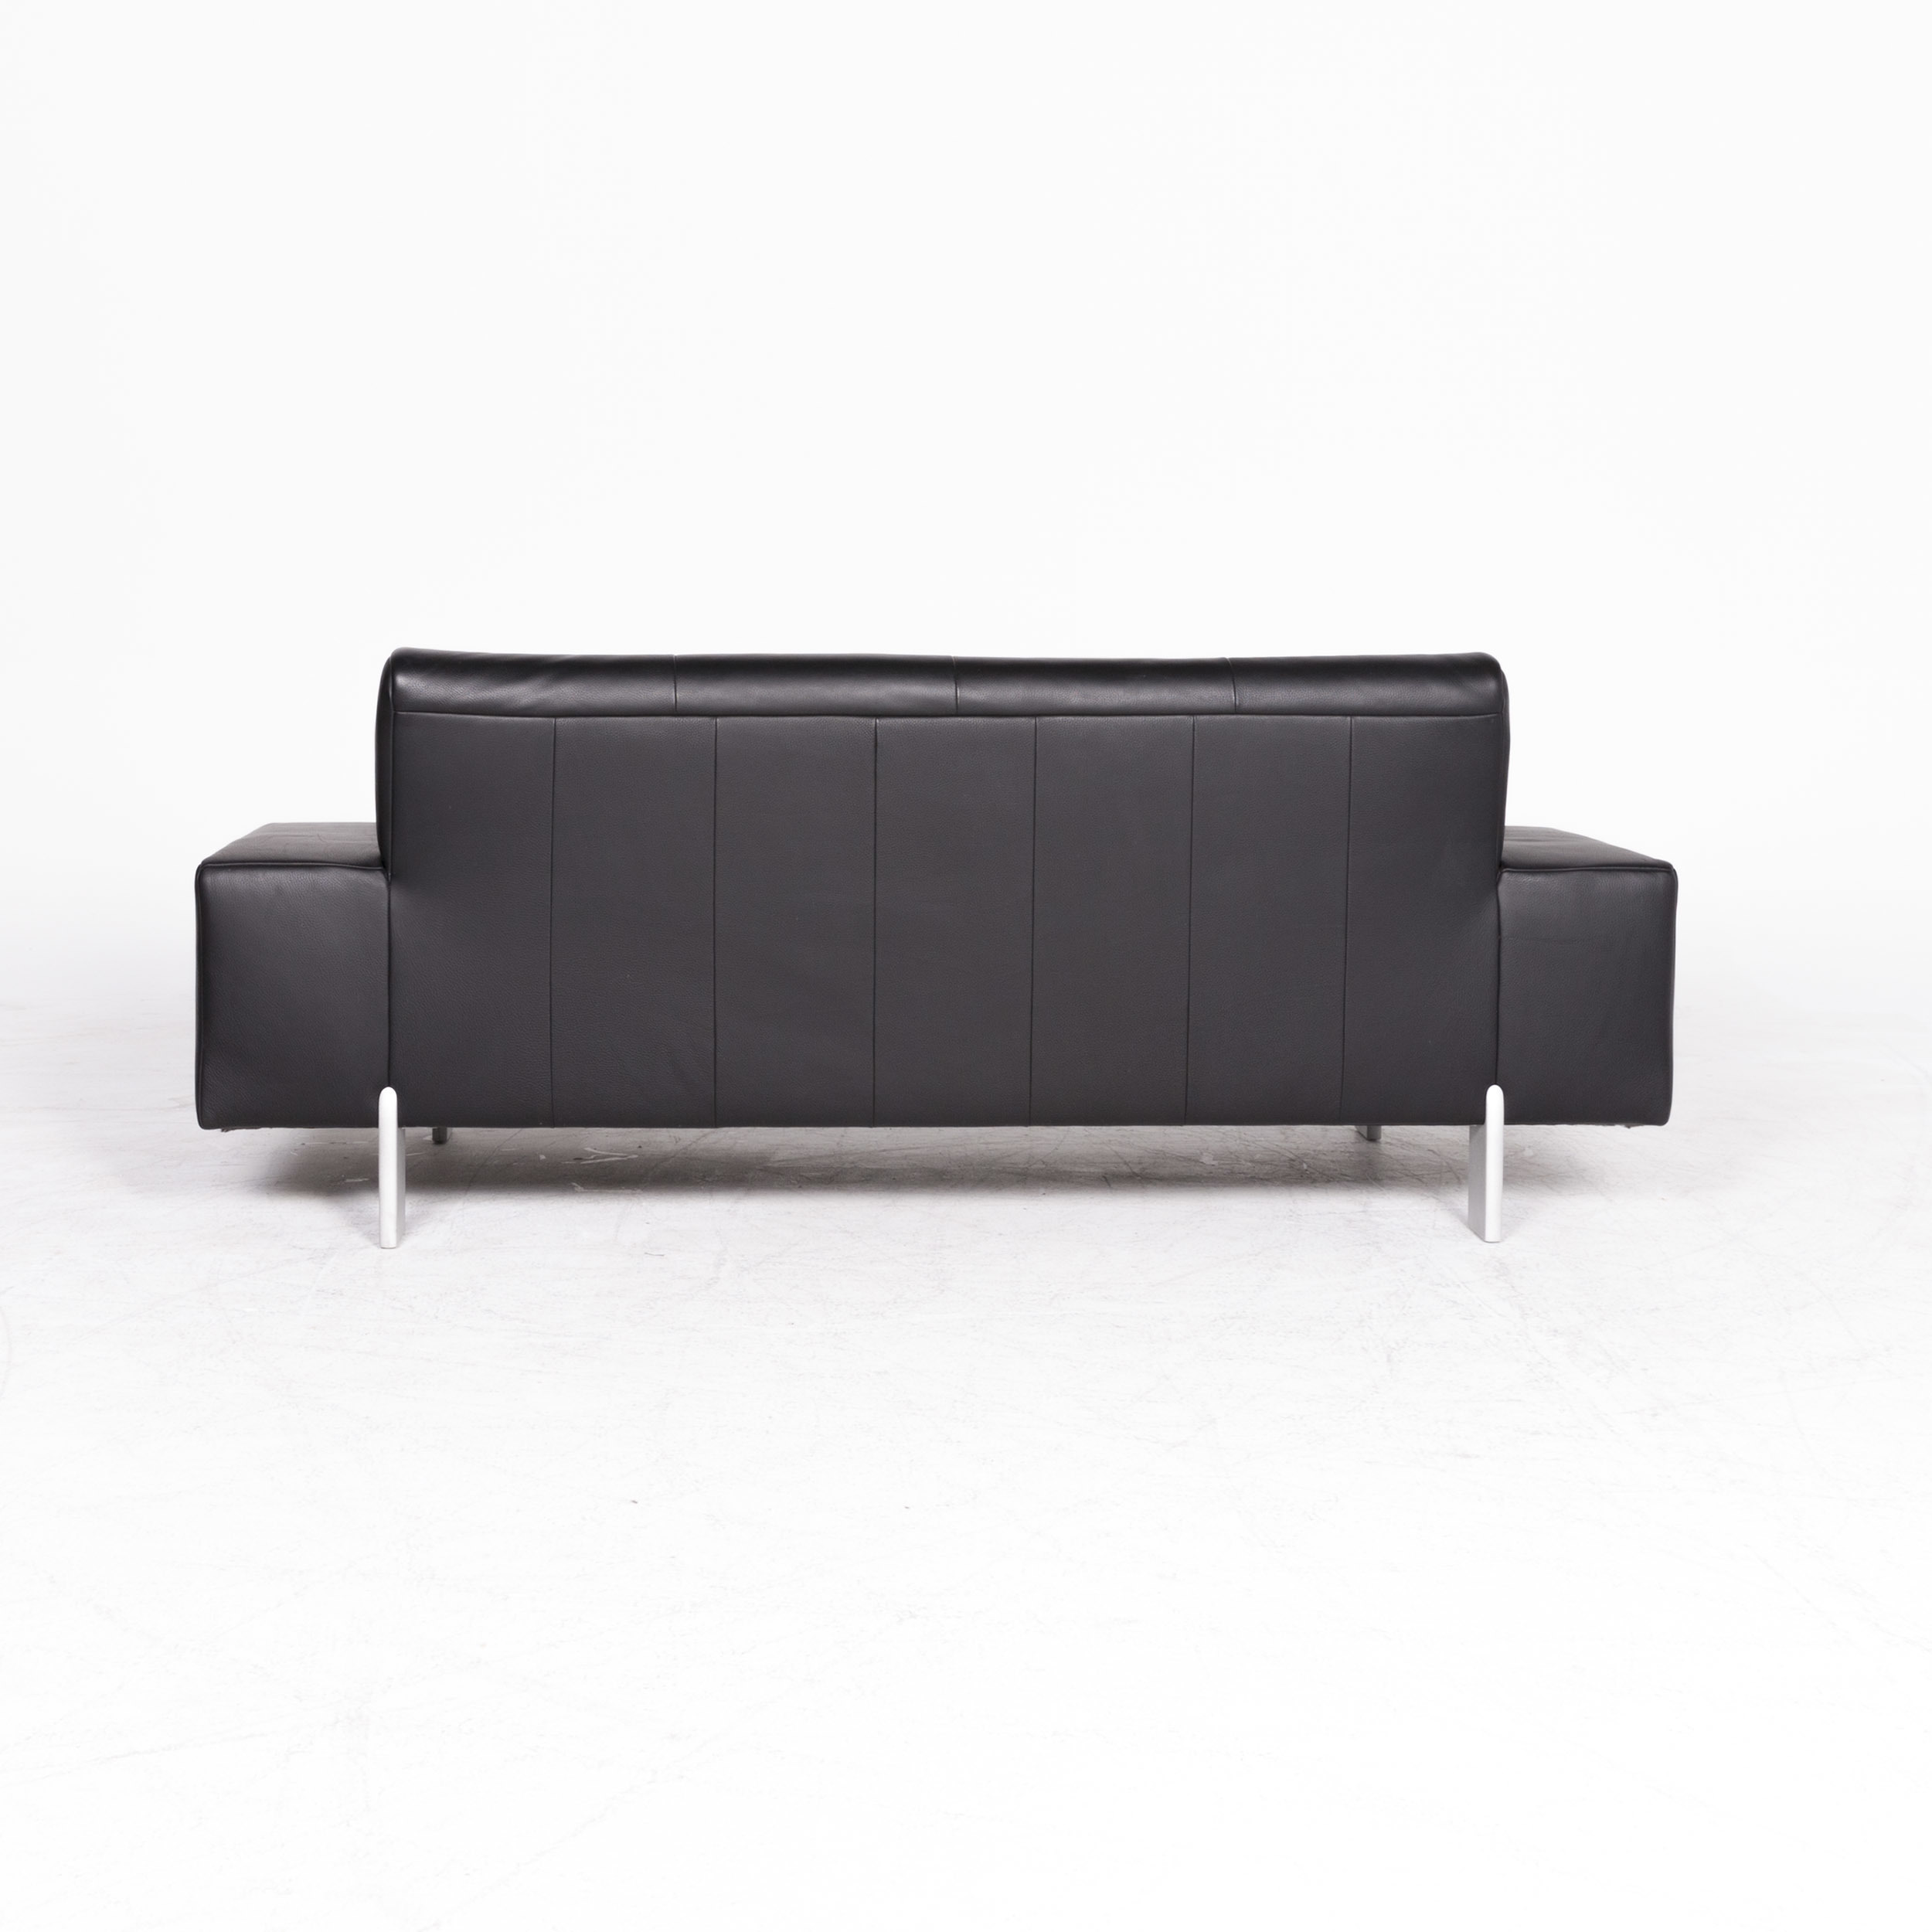 Rolf Benz Ak 644 Designer Leather Sofa Black Genuine Leather Three